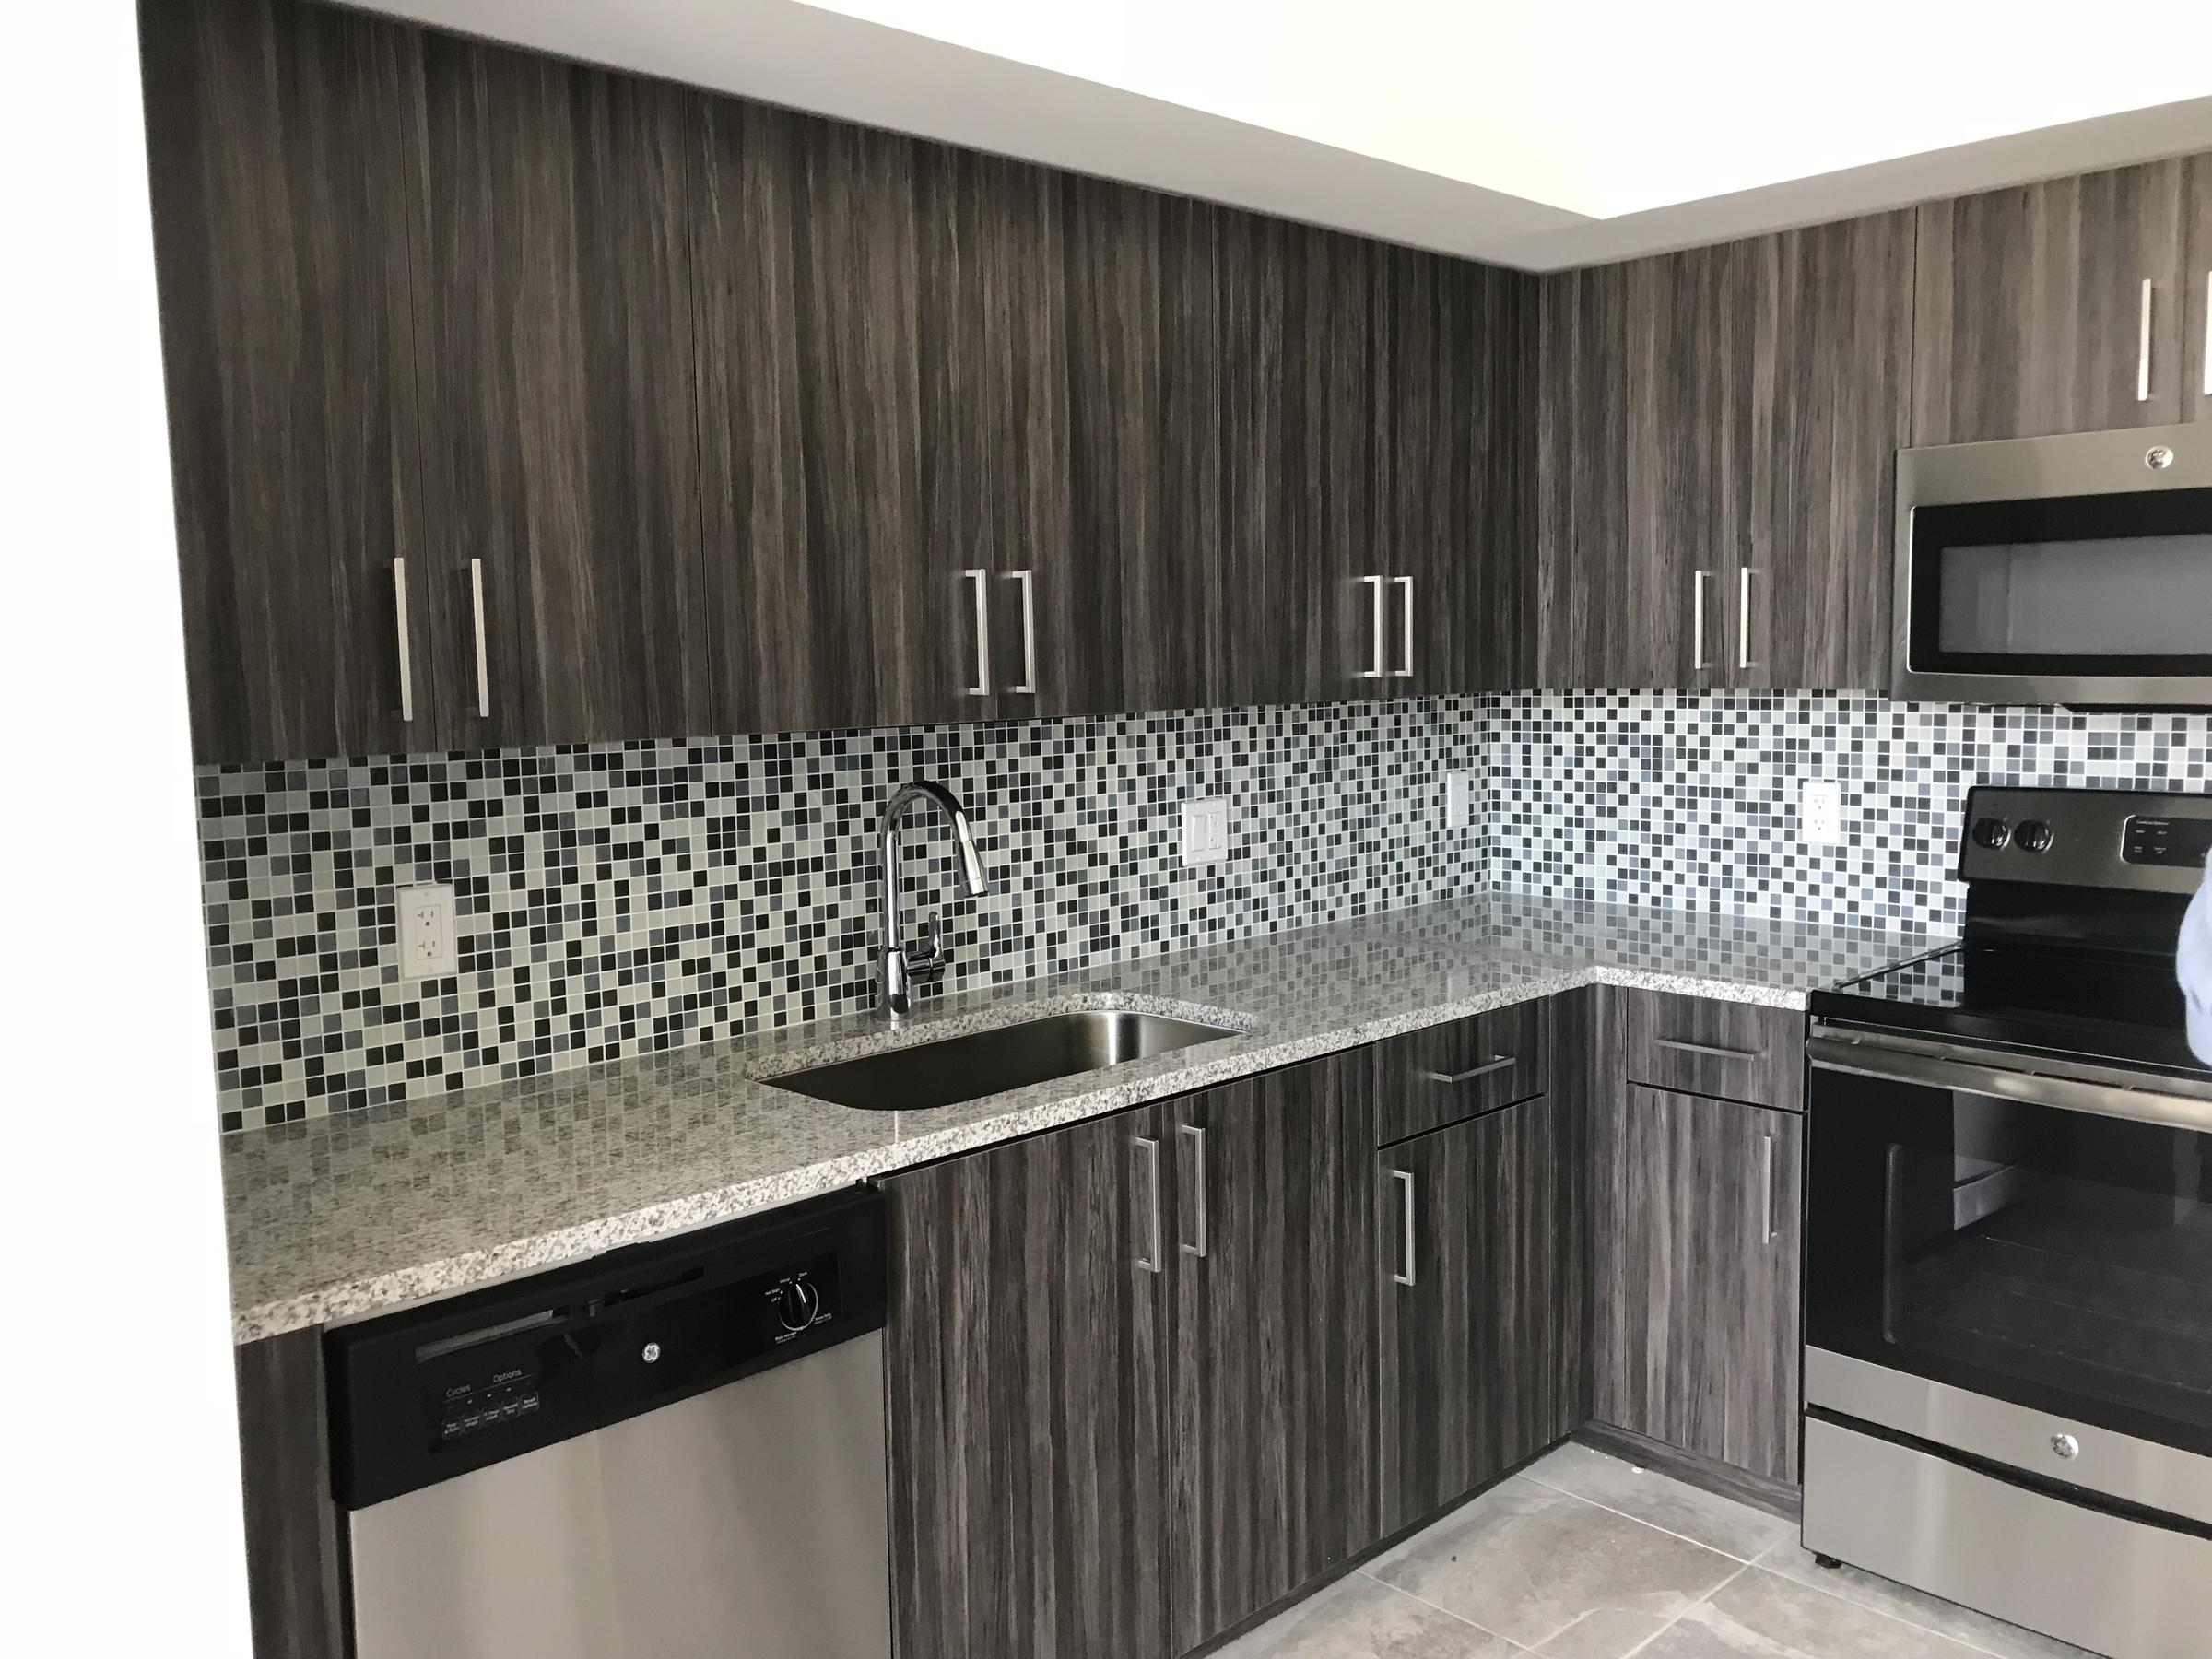 prices mobile best countertops backsplash images kitchen luxuriant counter granite ideas sh quartz affordable countertop